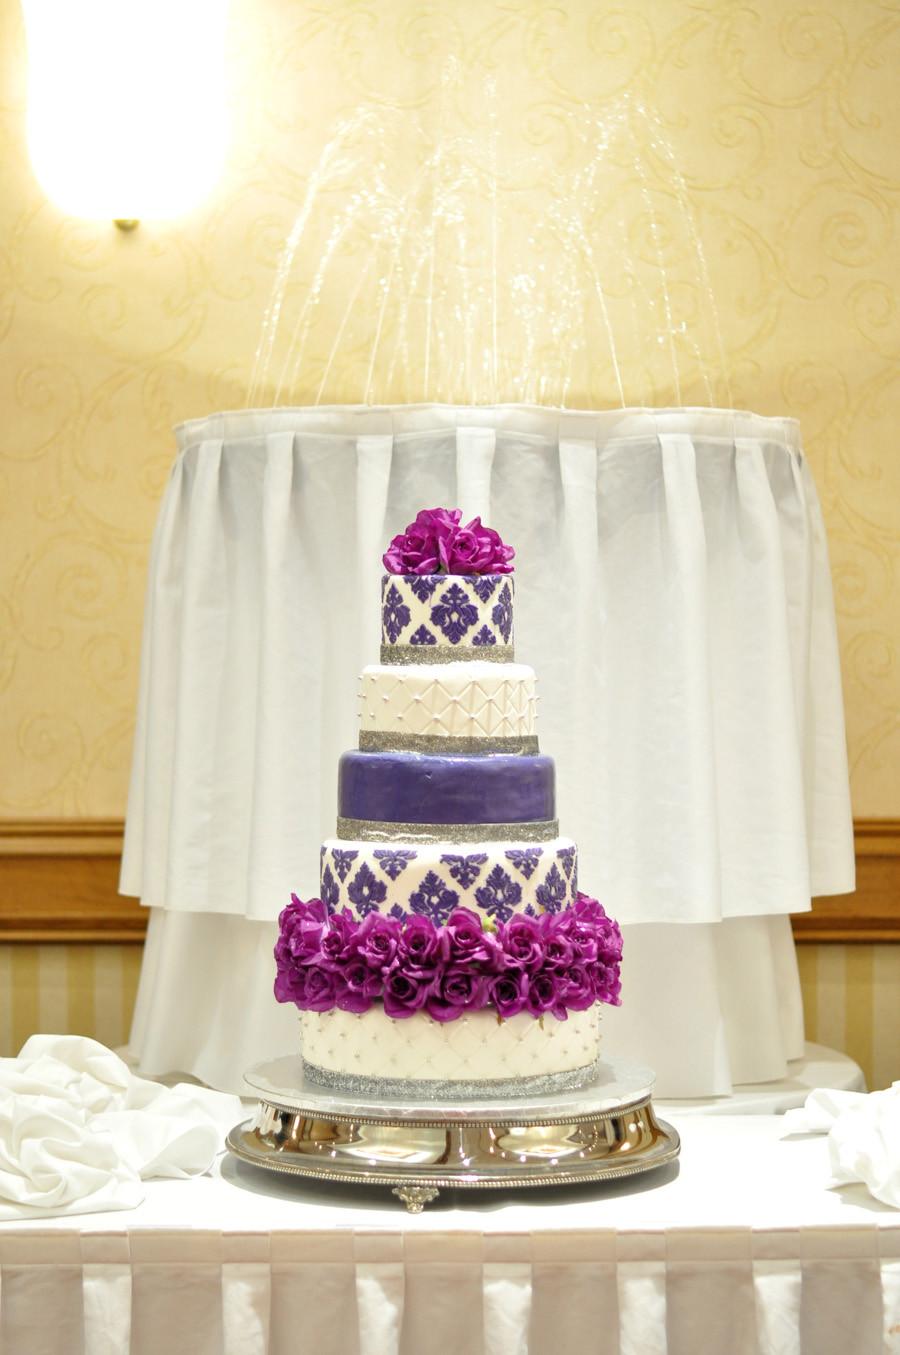 Wedding Cakes Springfield Mo  Wedding cake springfield mo idea in 2017